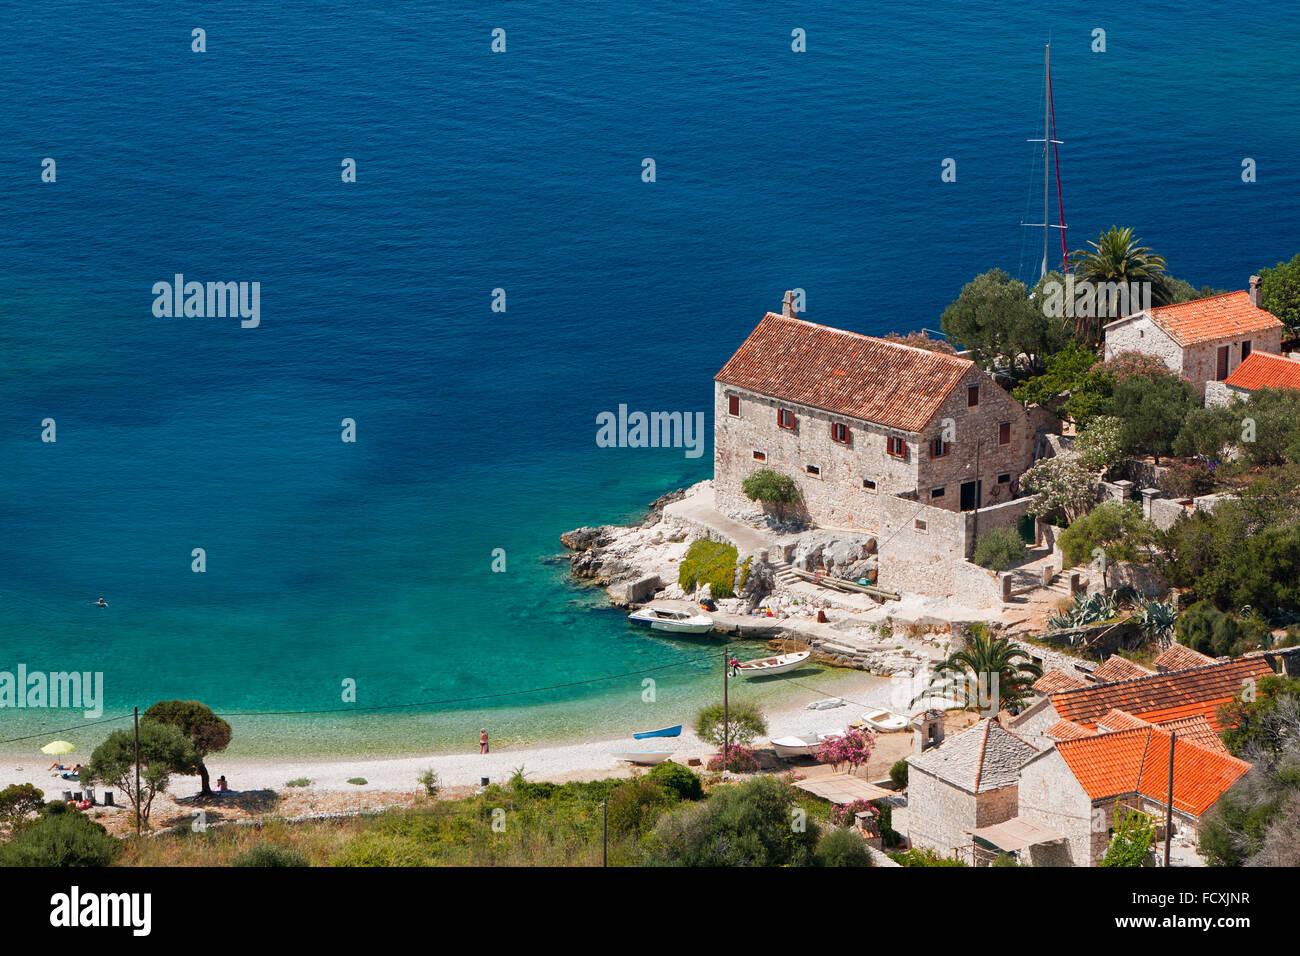 Dubovica beach, island Hvar, Croatia - Stock Image